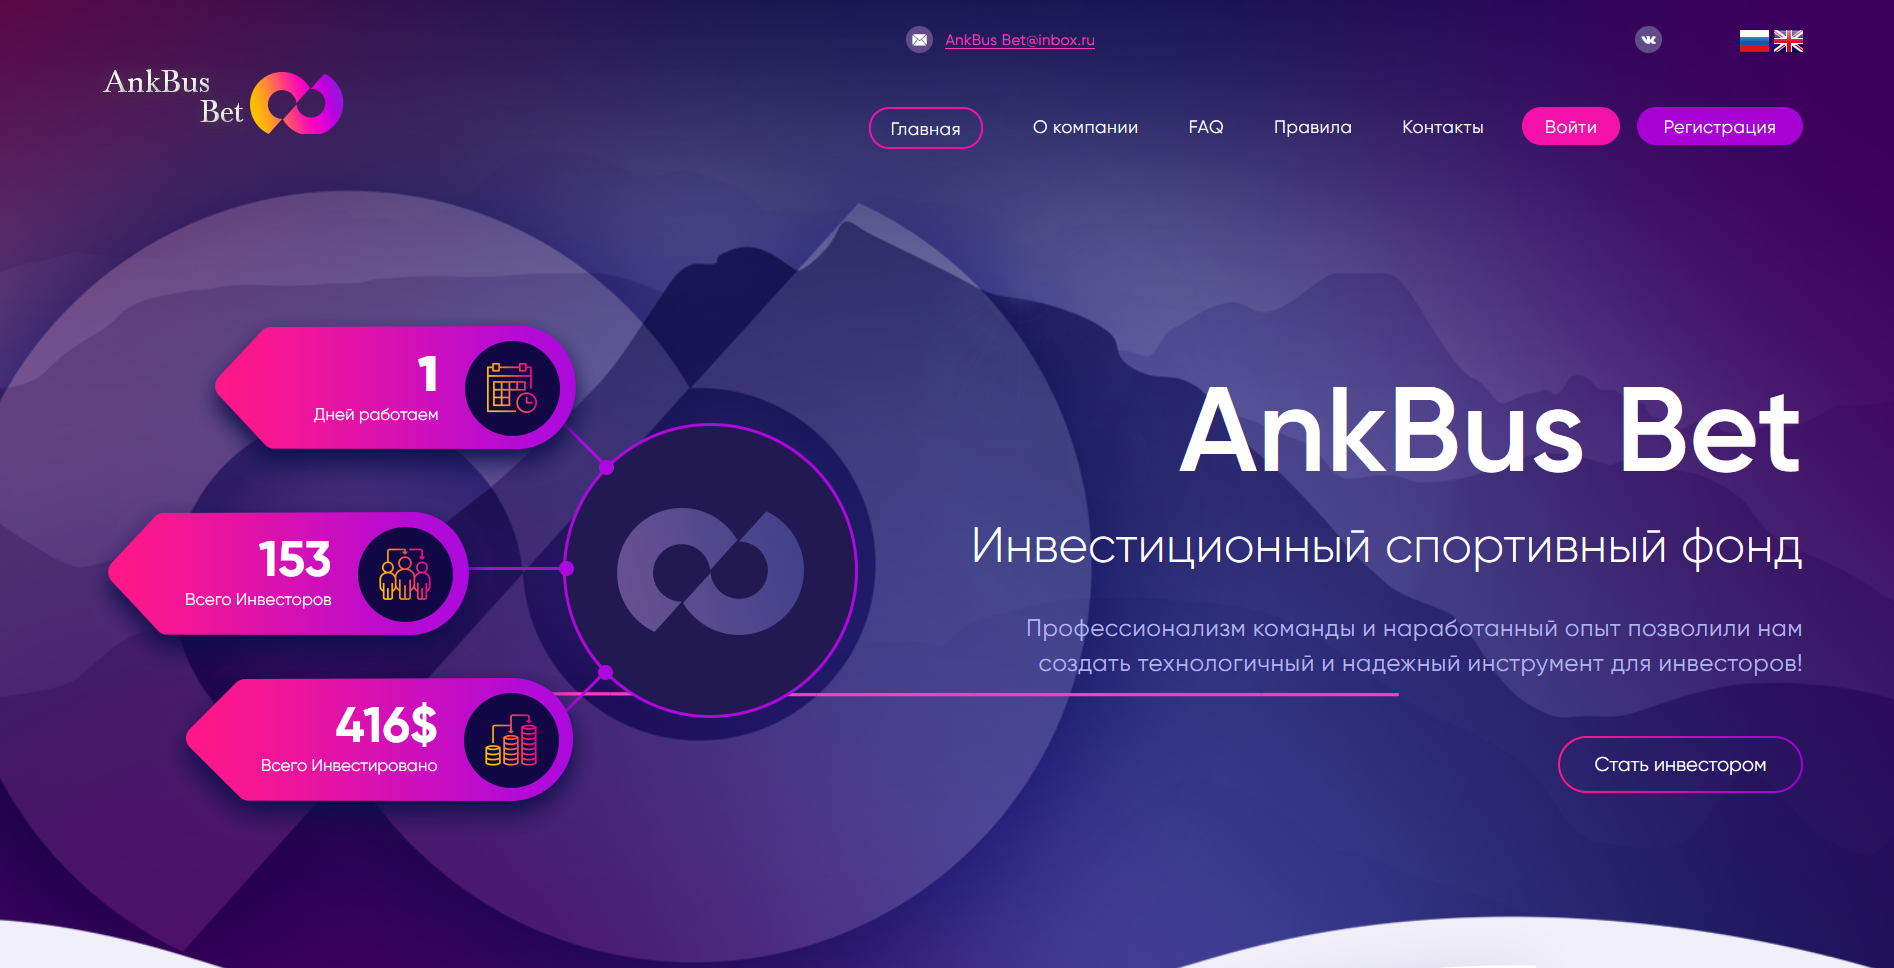 AnkBus Bet